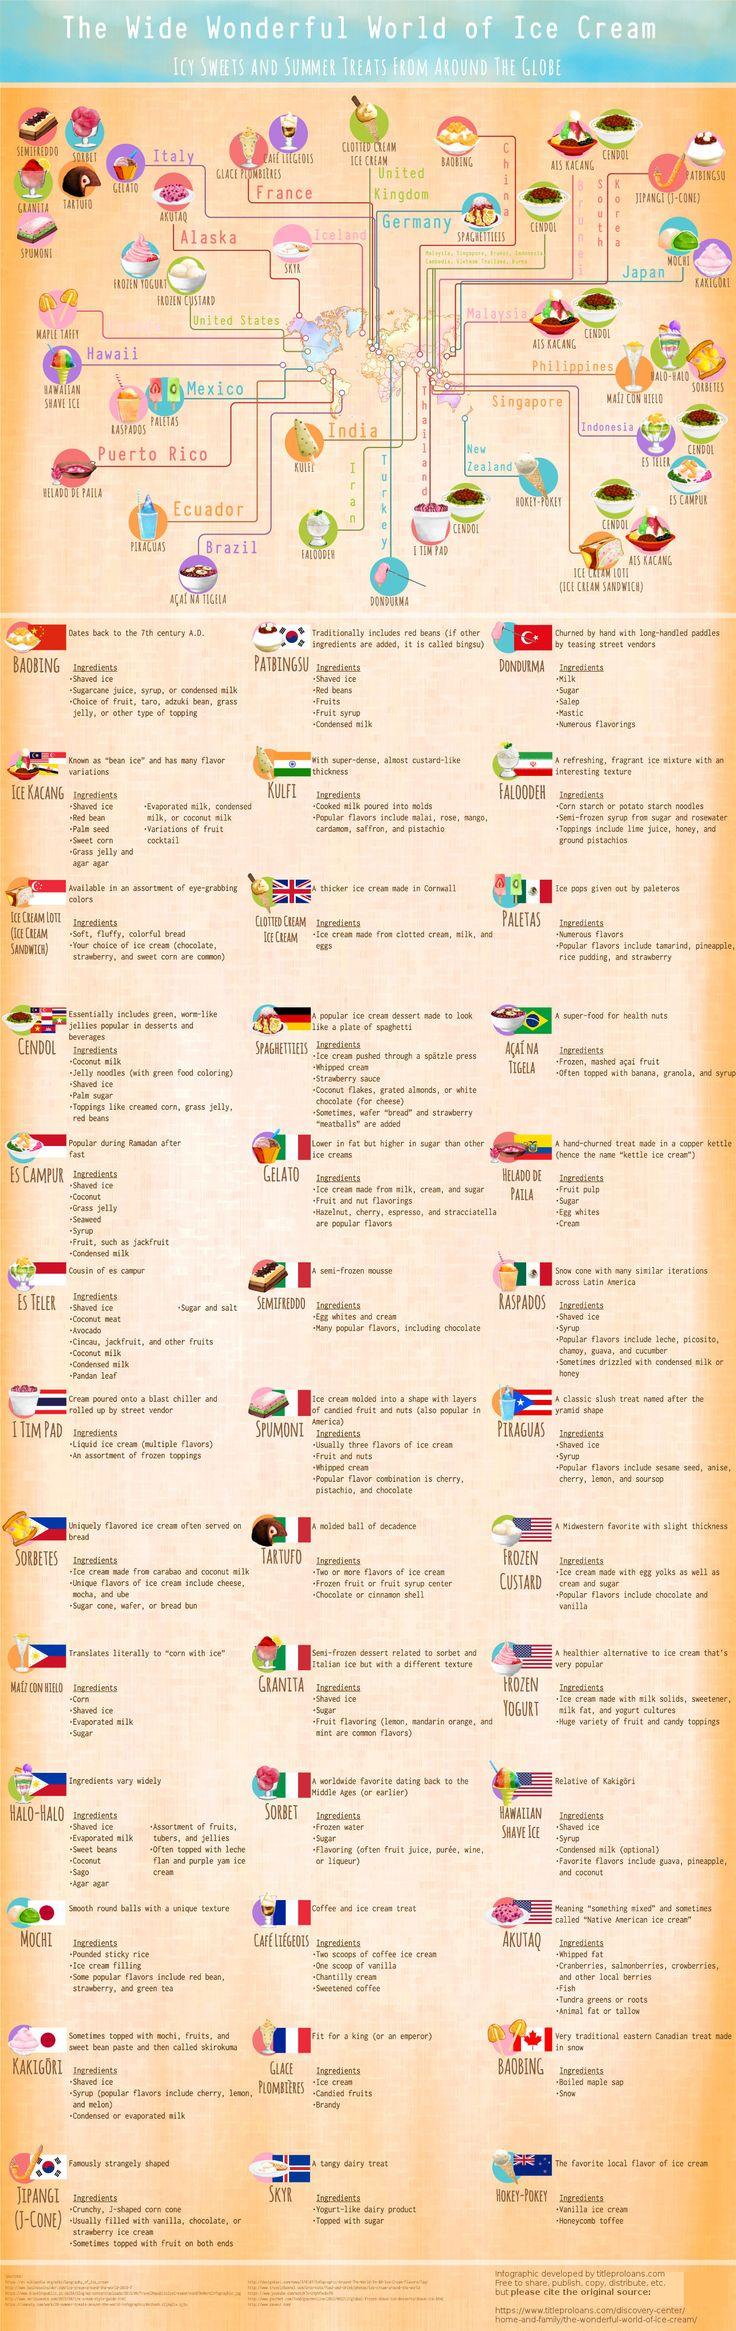 Ice cream around the world - Album on Imgur